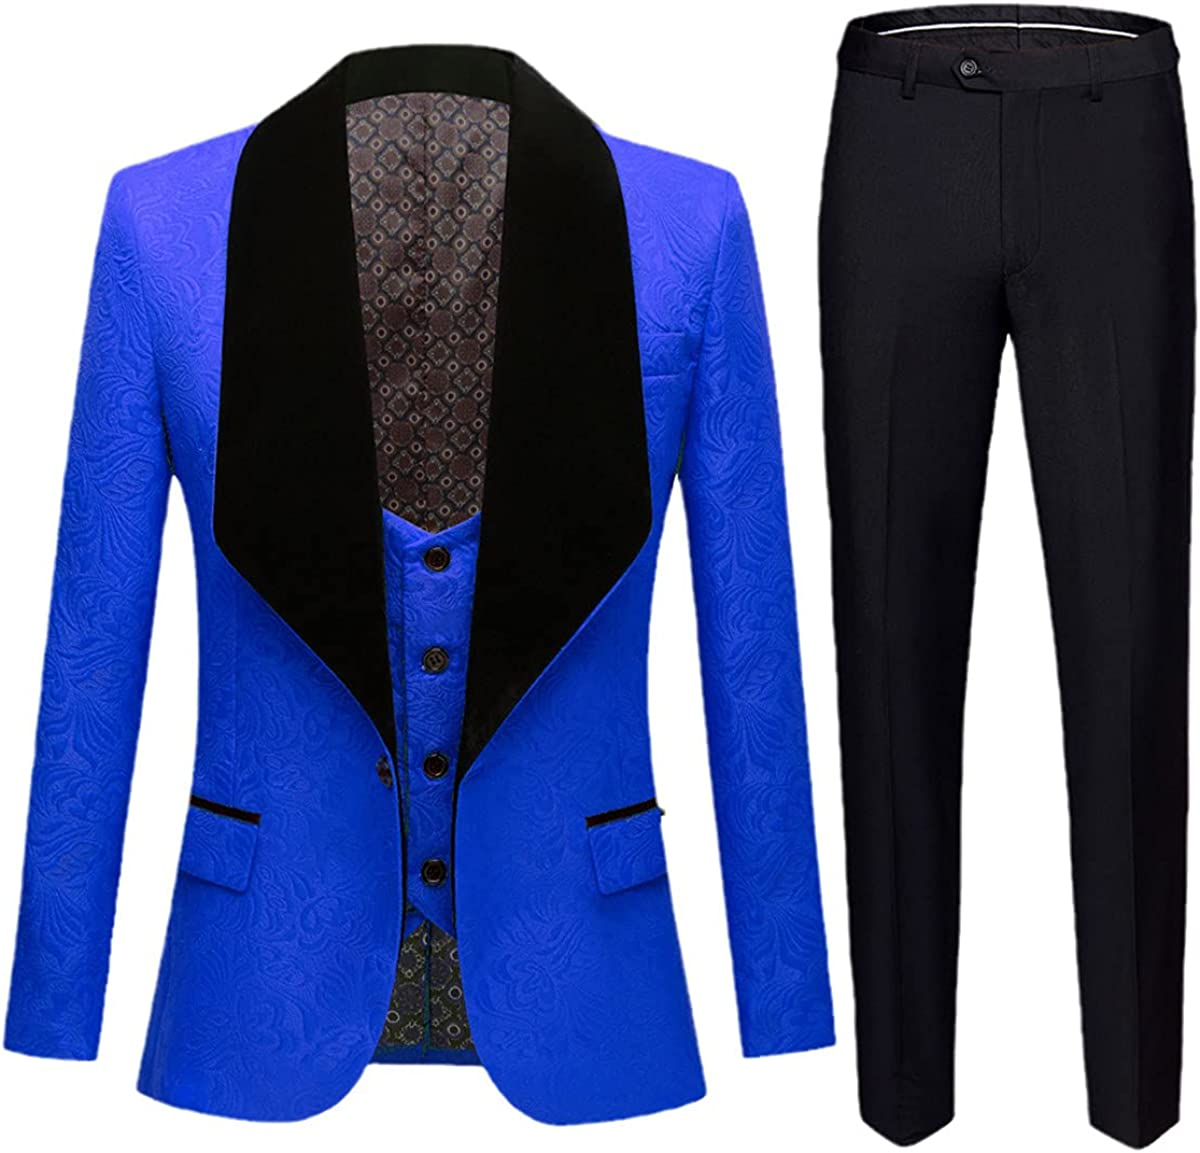 Men's Fashion Big Shawl Lapel 3 Piece Set Pink red Blue White Black Wedding Groom Suit Banquet Tuxedo